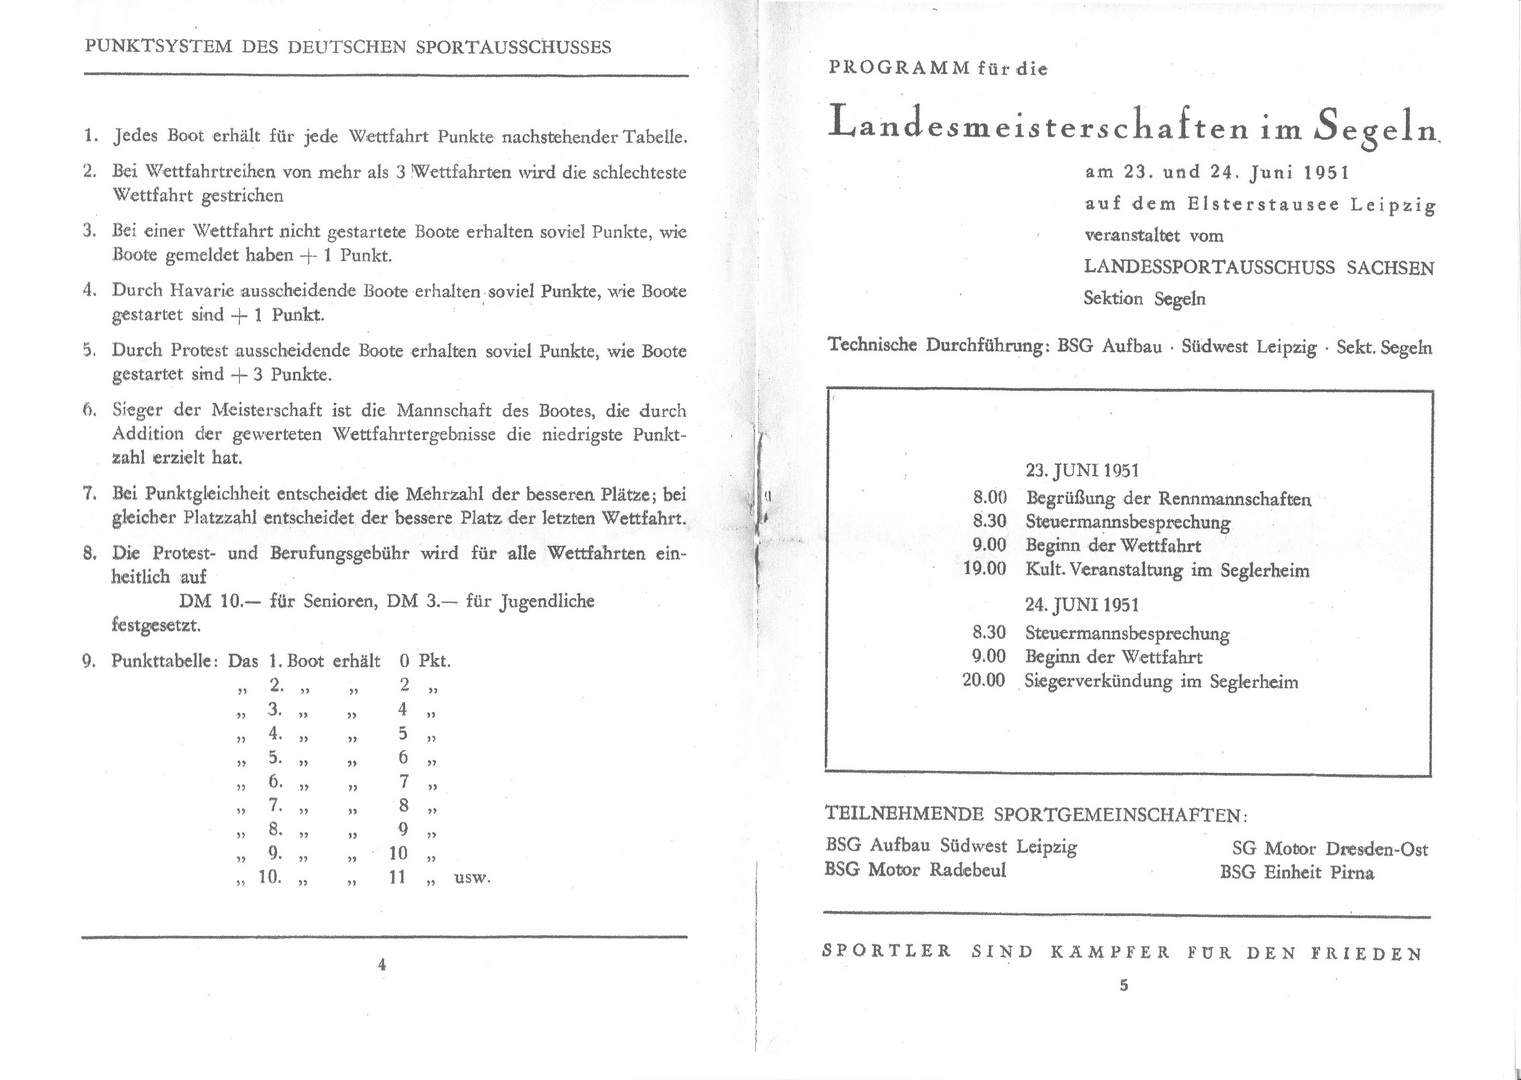 Landesmeisterschaft 1951 - Programm, Punktesystem